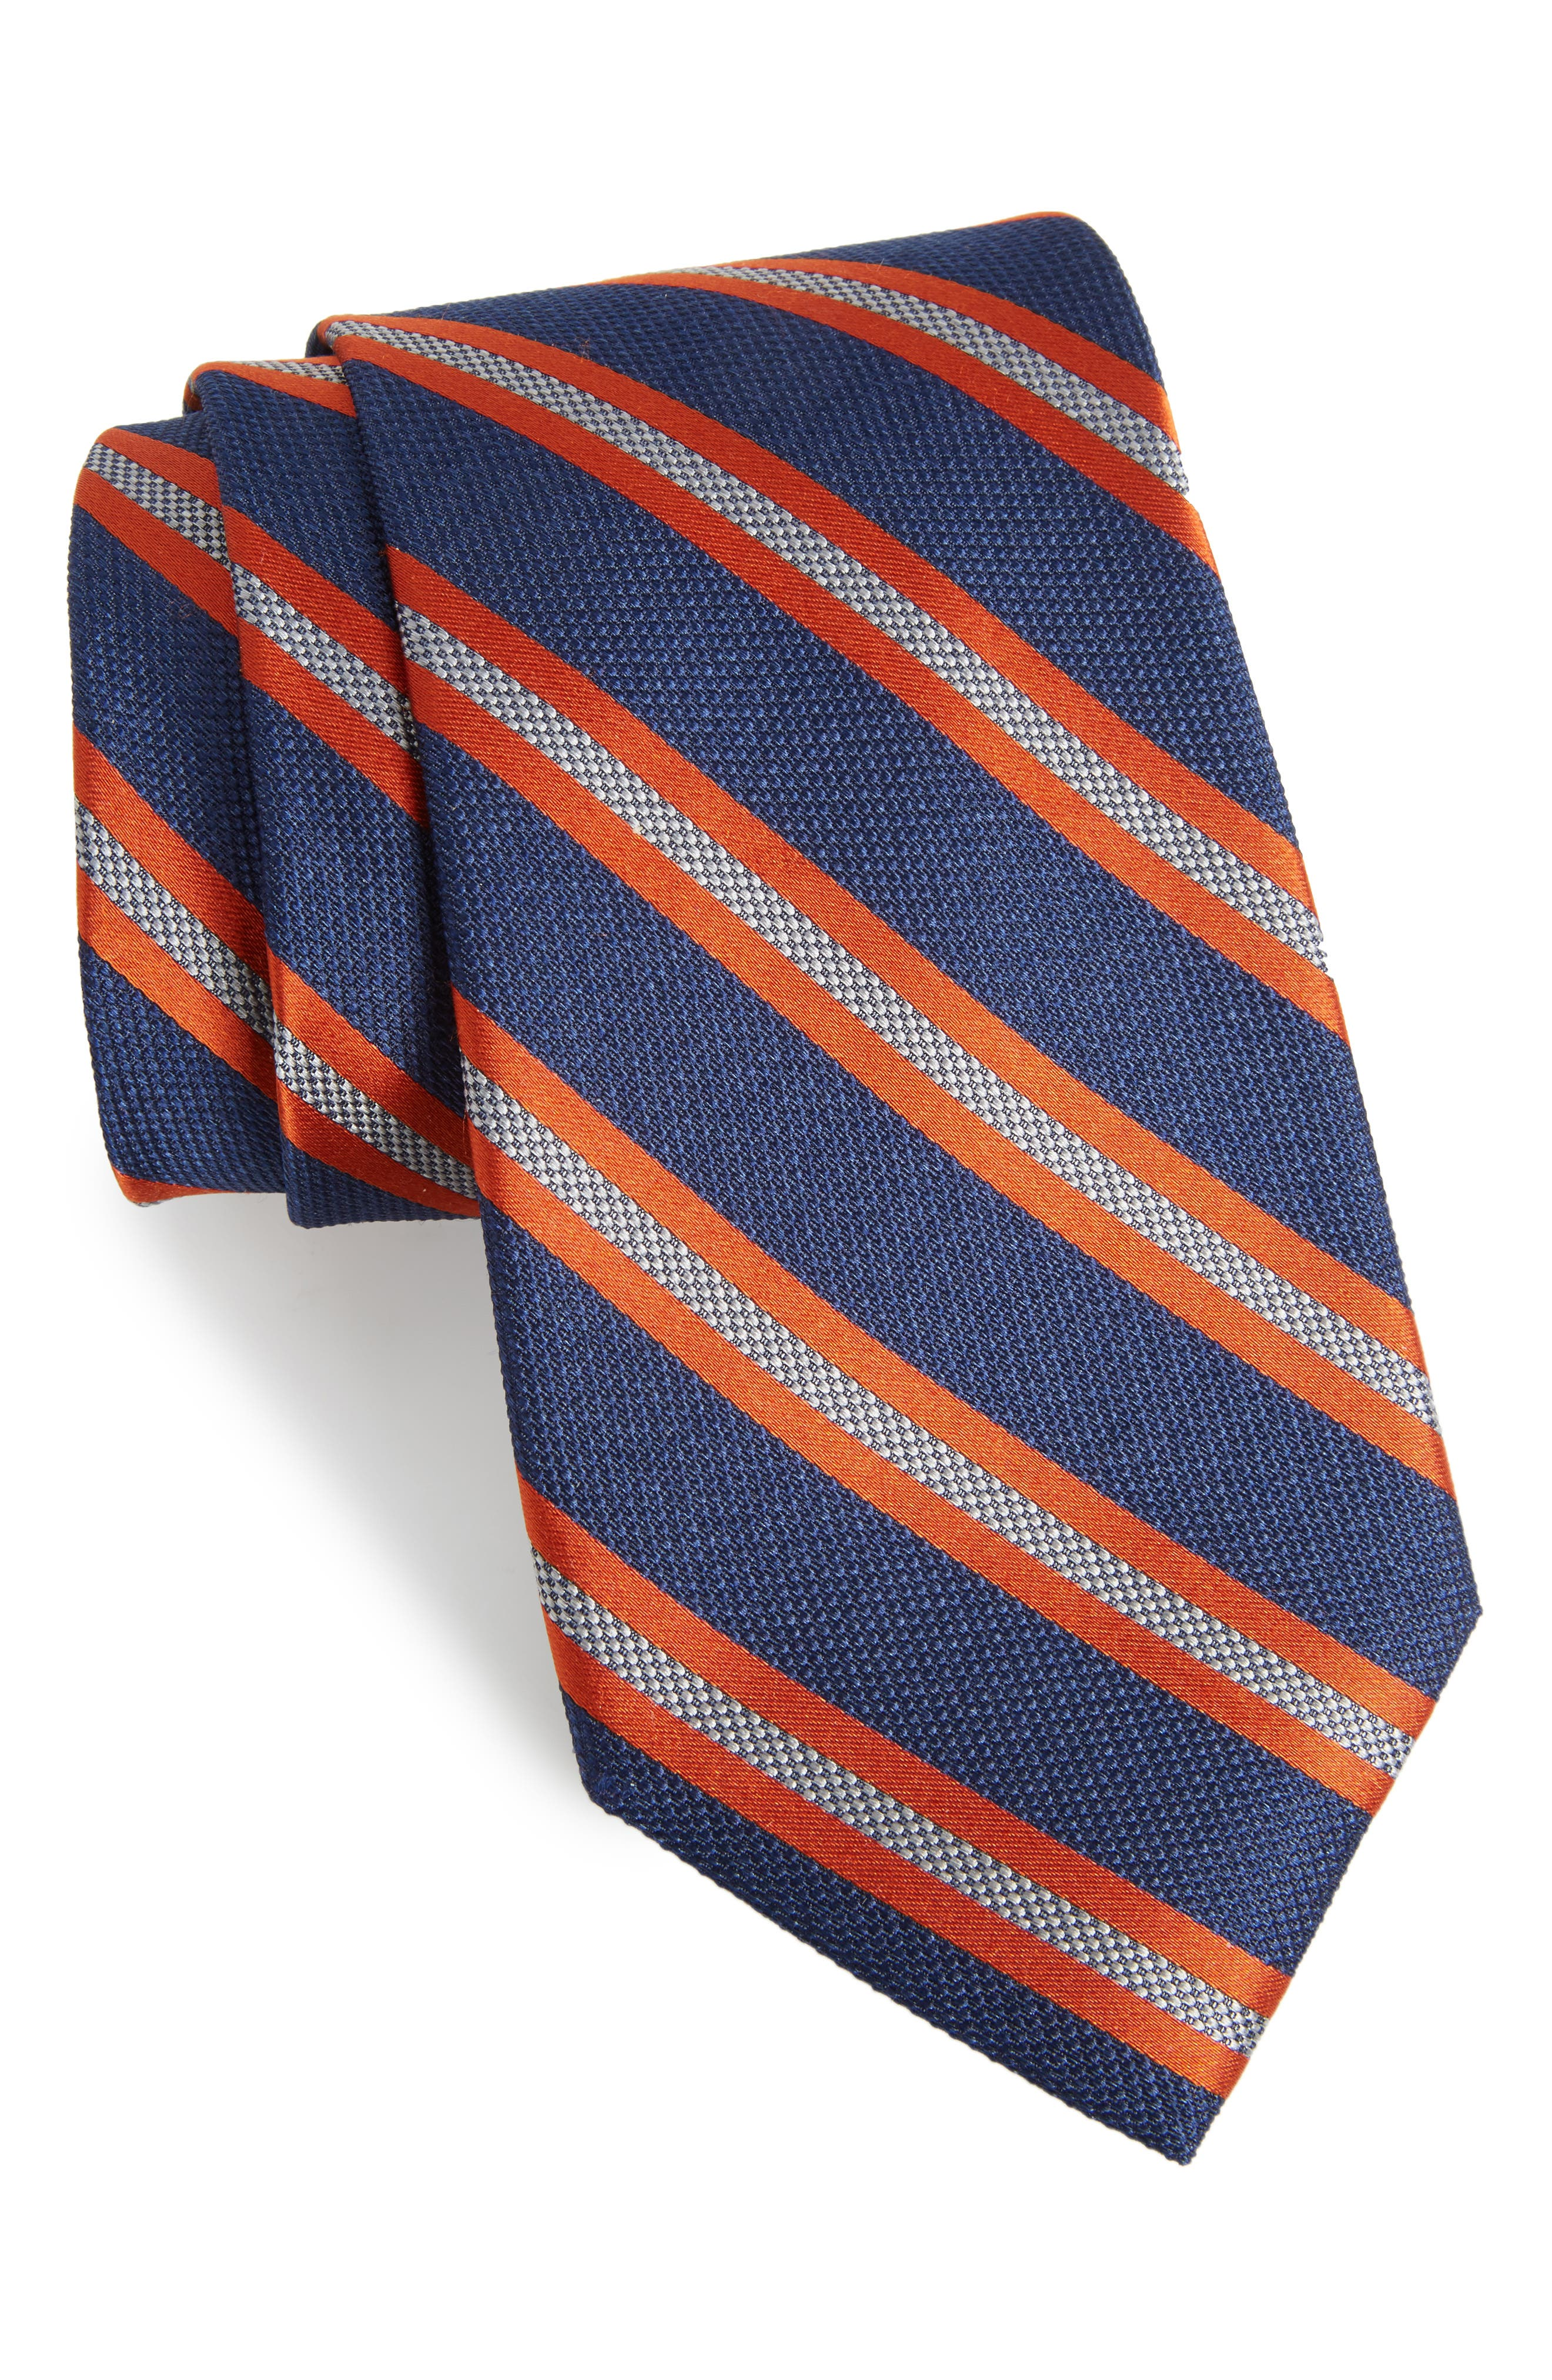 Main Image - Nordstrom Men's Shop Oxford Stripe Silk Tie (X-Long)